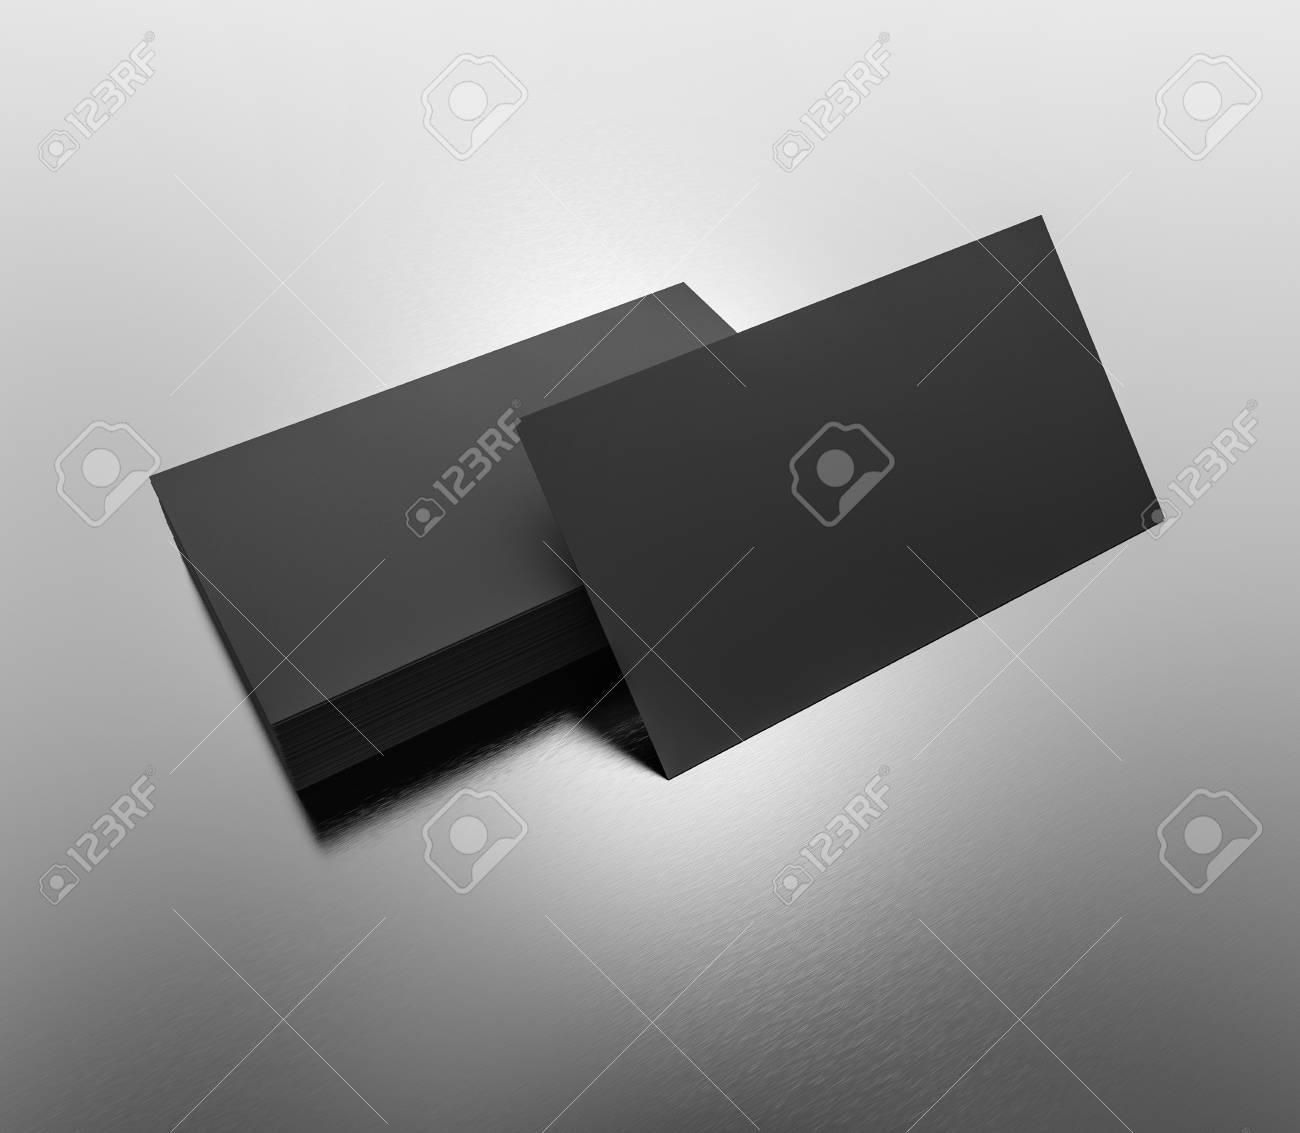 Black Business Cards Blank Mockup Template 3d Rendering